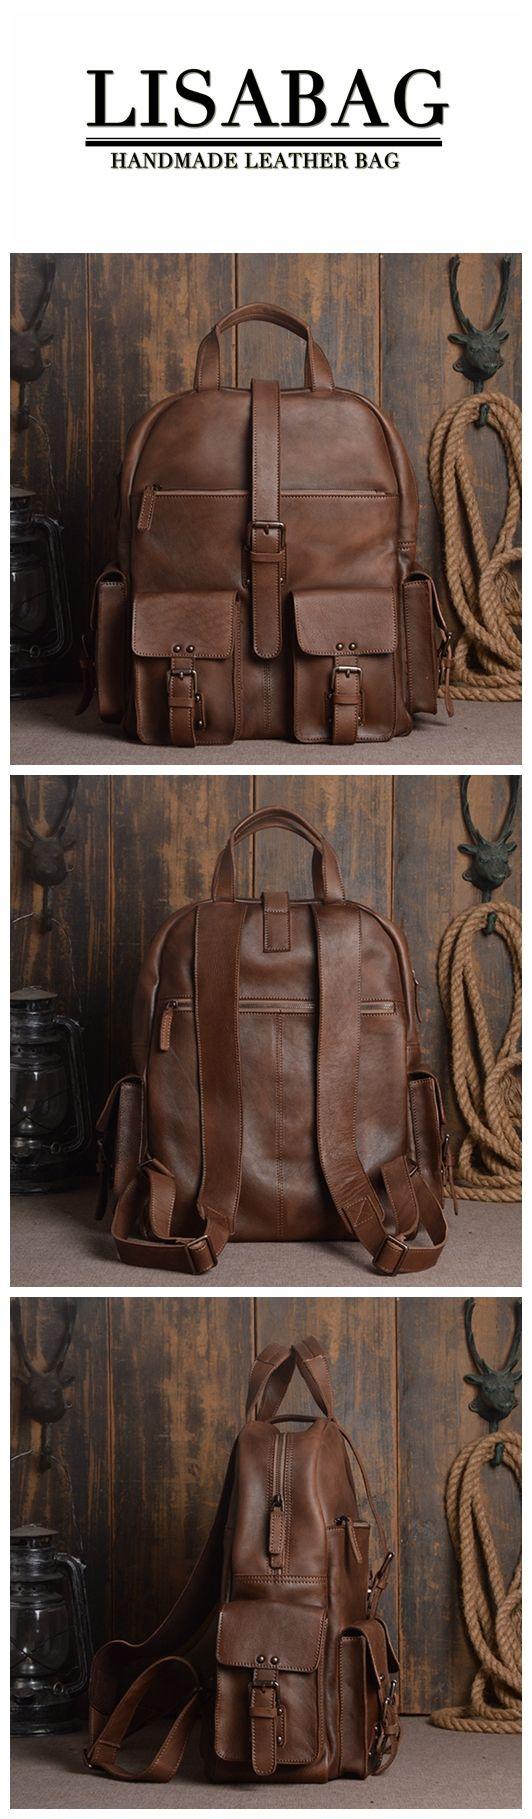 Handmade Vegetable Tanned Leather School Backpack Large Travel Backpack 15'' Laptop Bag 9045